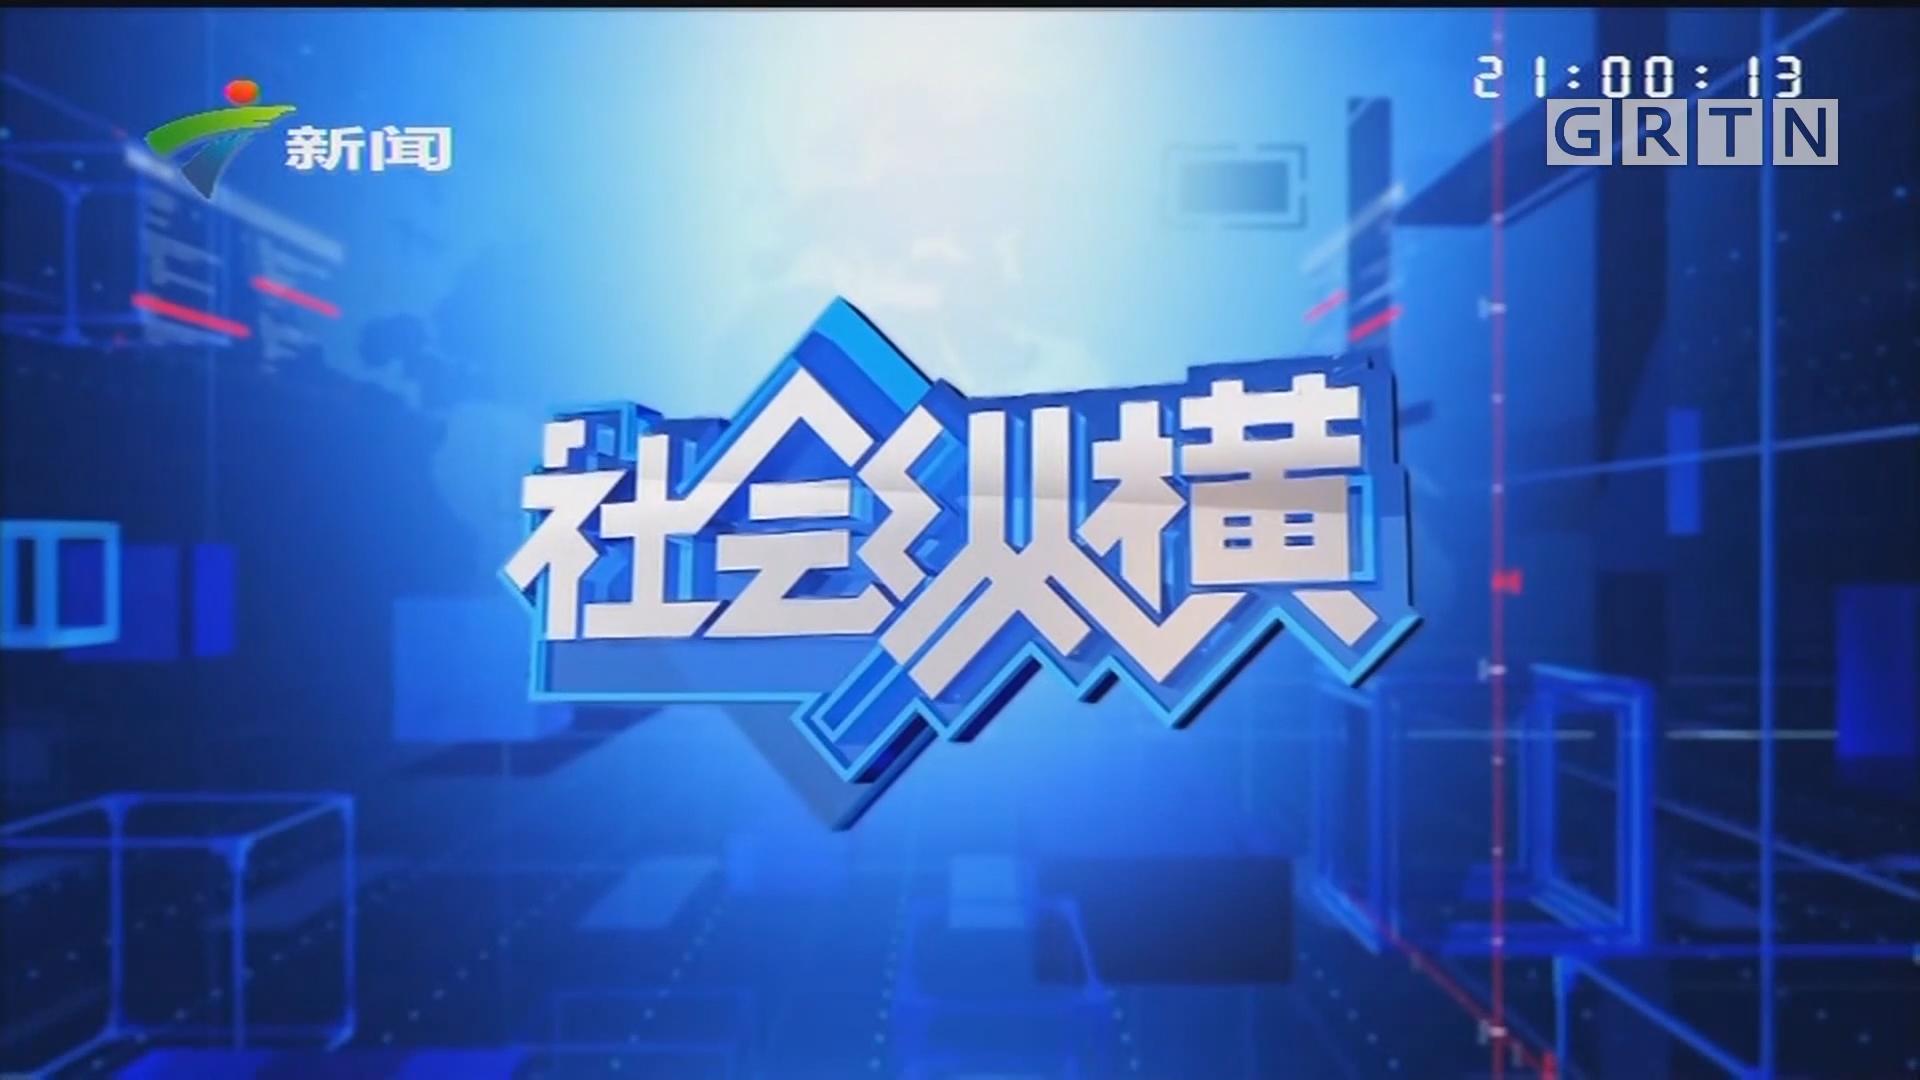 [HD][2019-07-09]社会纵横:阳江阳西 差额油补究竟卡在哪?